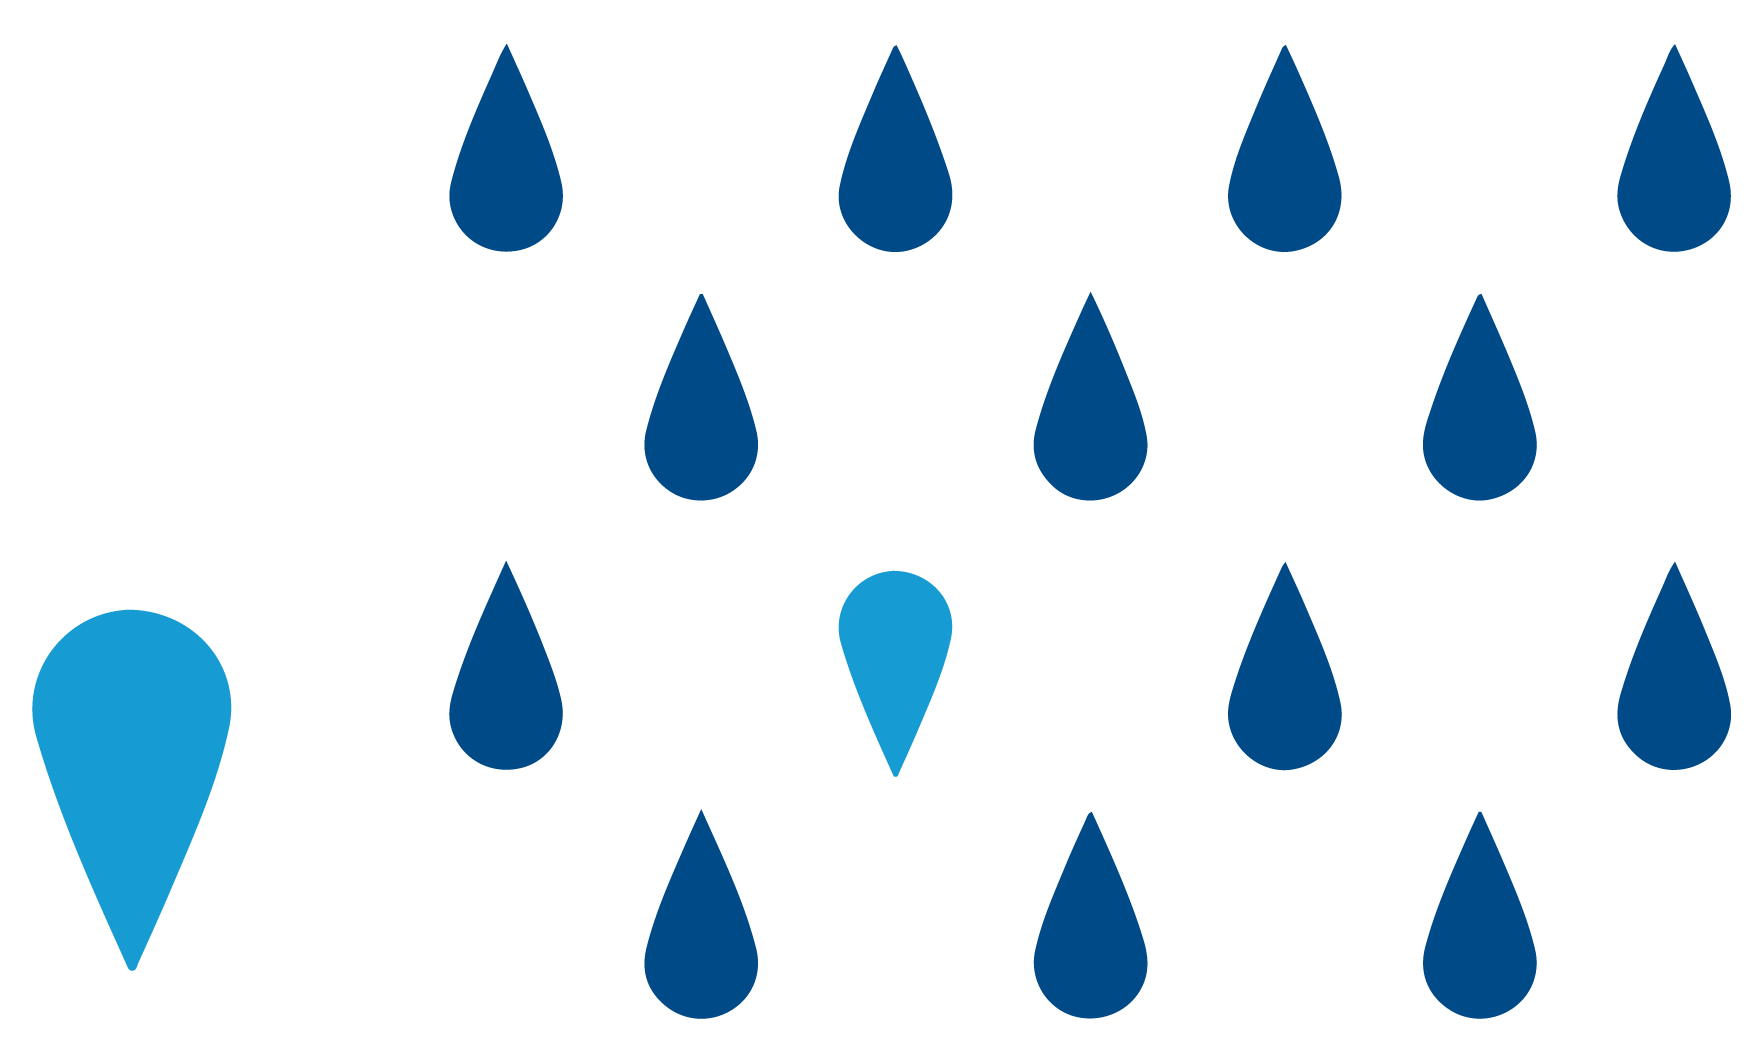 Evaporation clipart rain. Aston evaporative services is